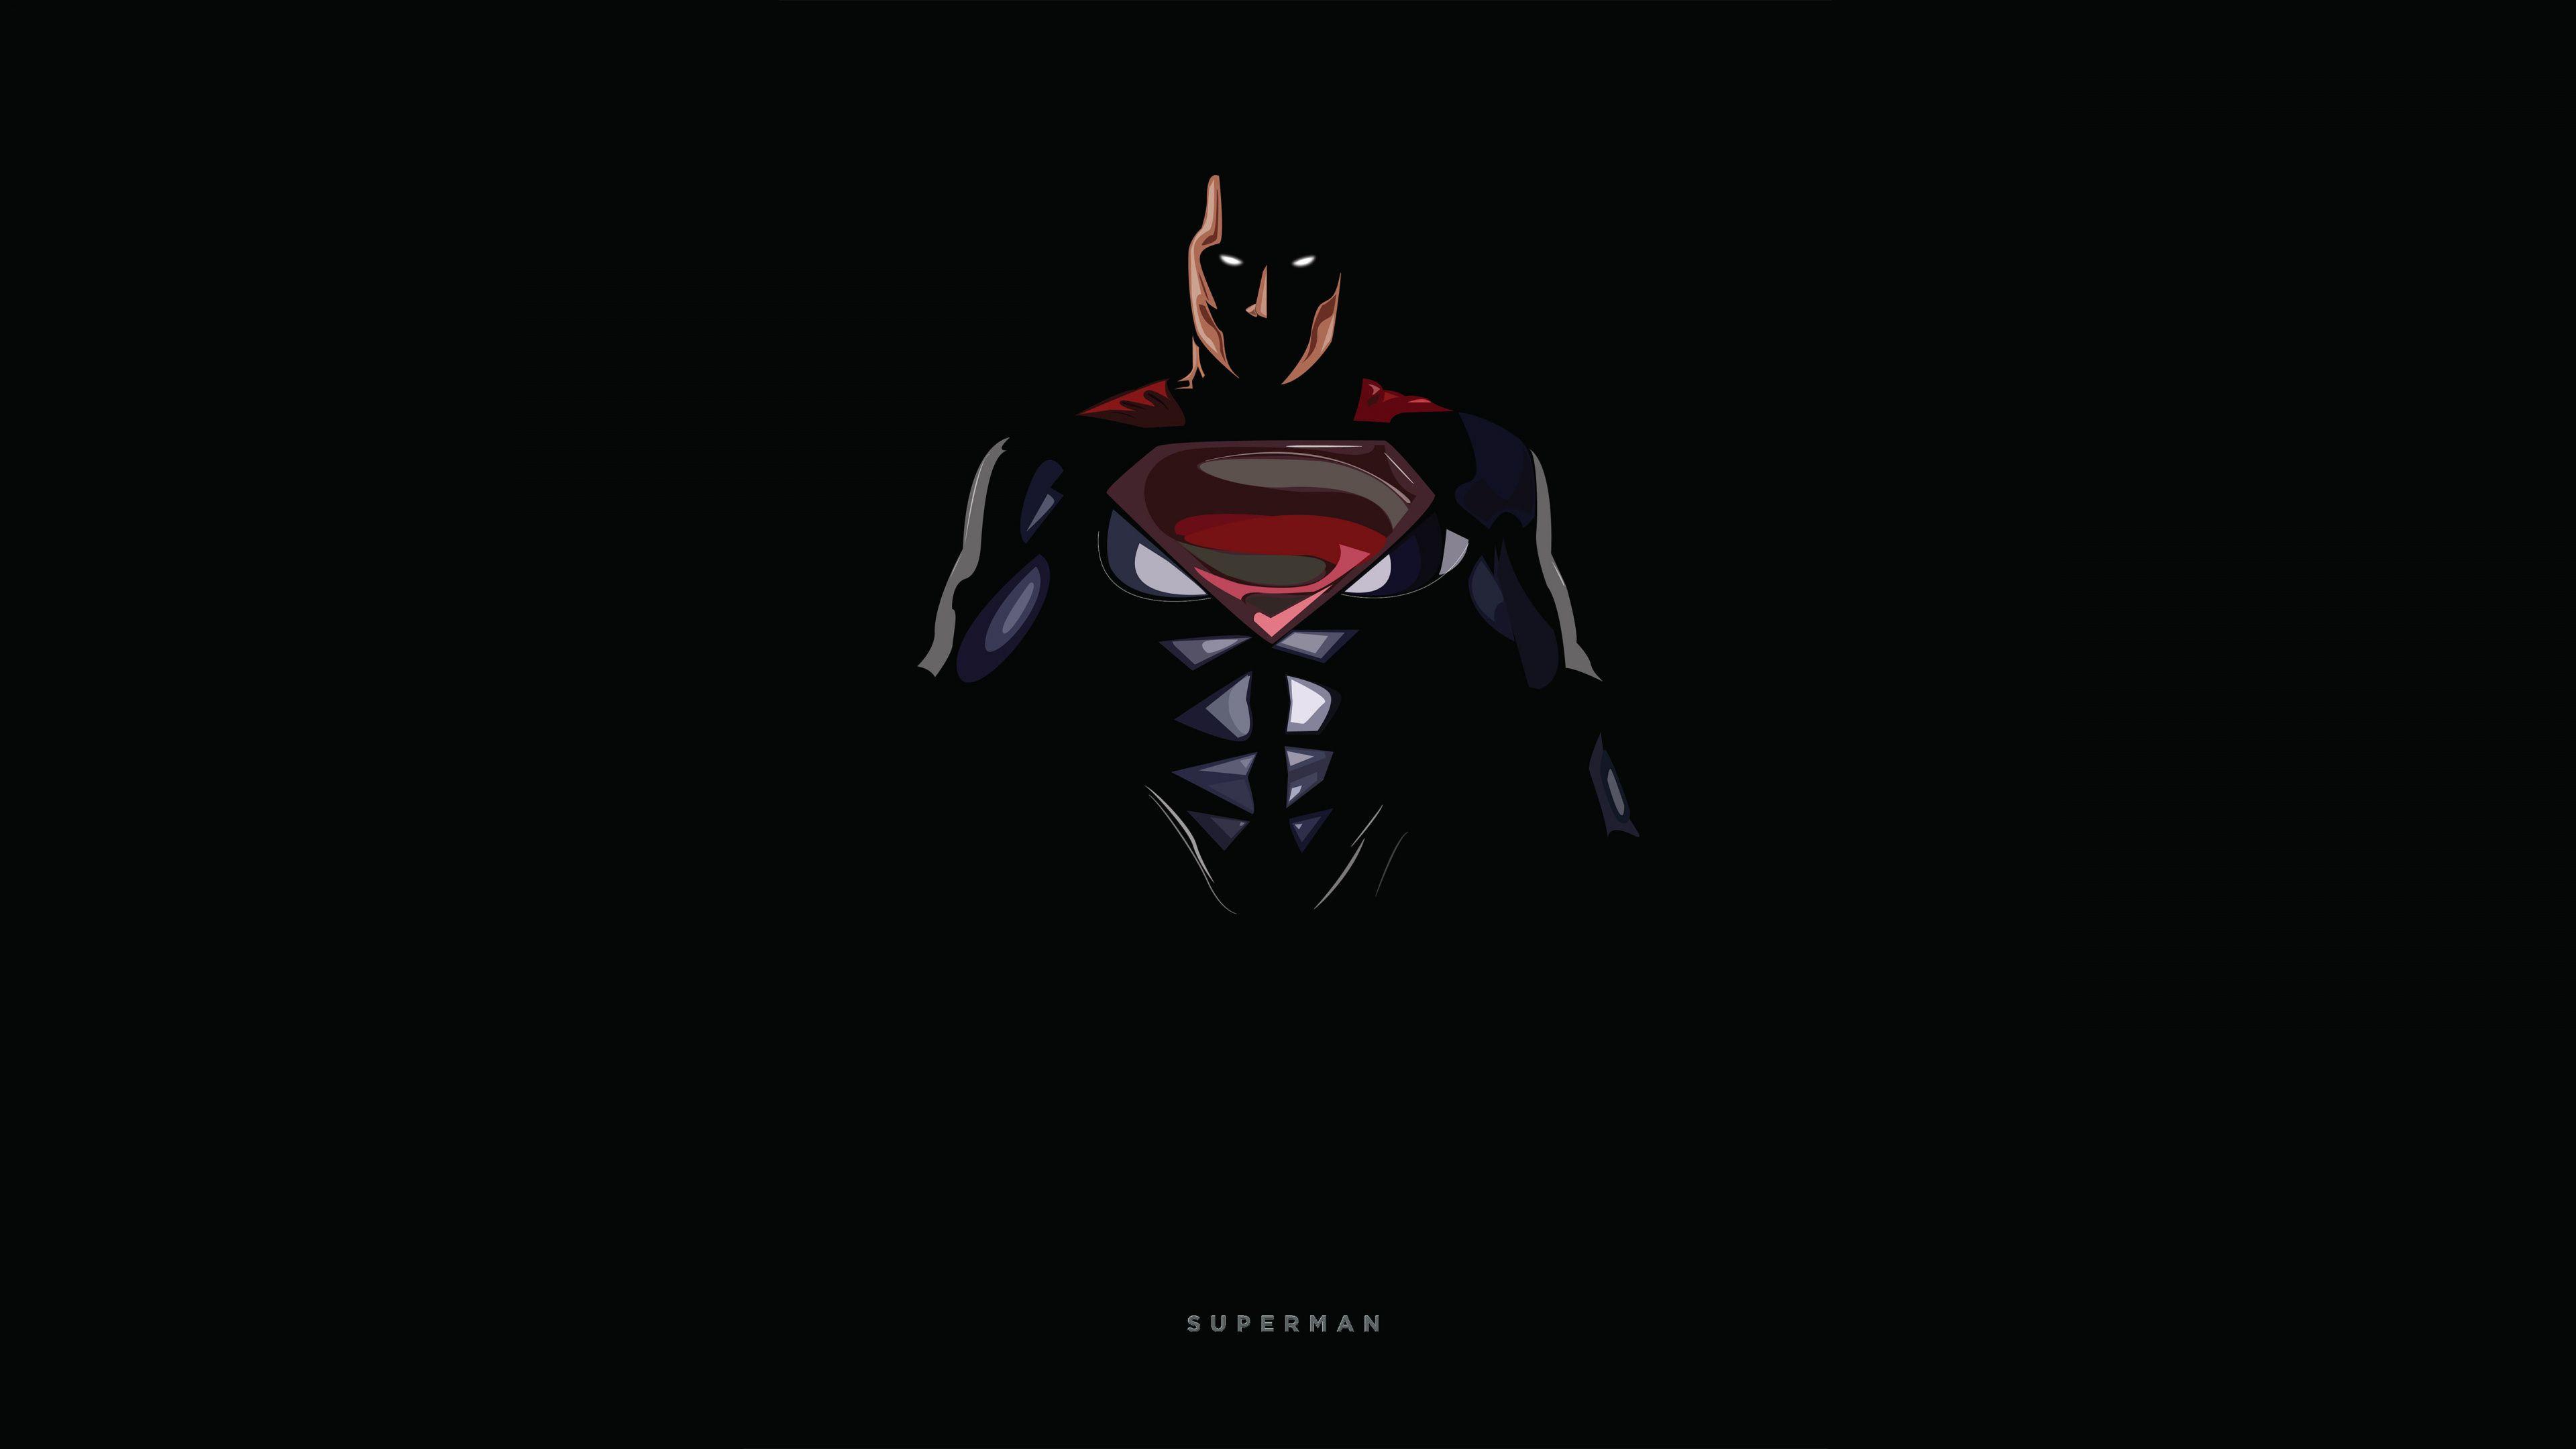 Download 3840x2160 Wallpaper Superman Dark Minimal 4k Uhd 16 9 Widescreen 3840x2160 Hd Image B Superman Wallpaper Superman Hd Wallpaper Dark Backgrounds